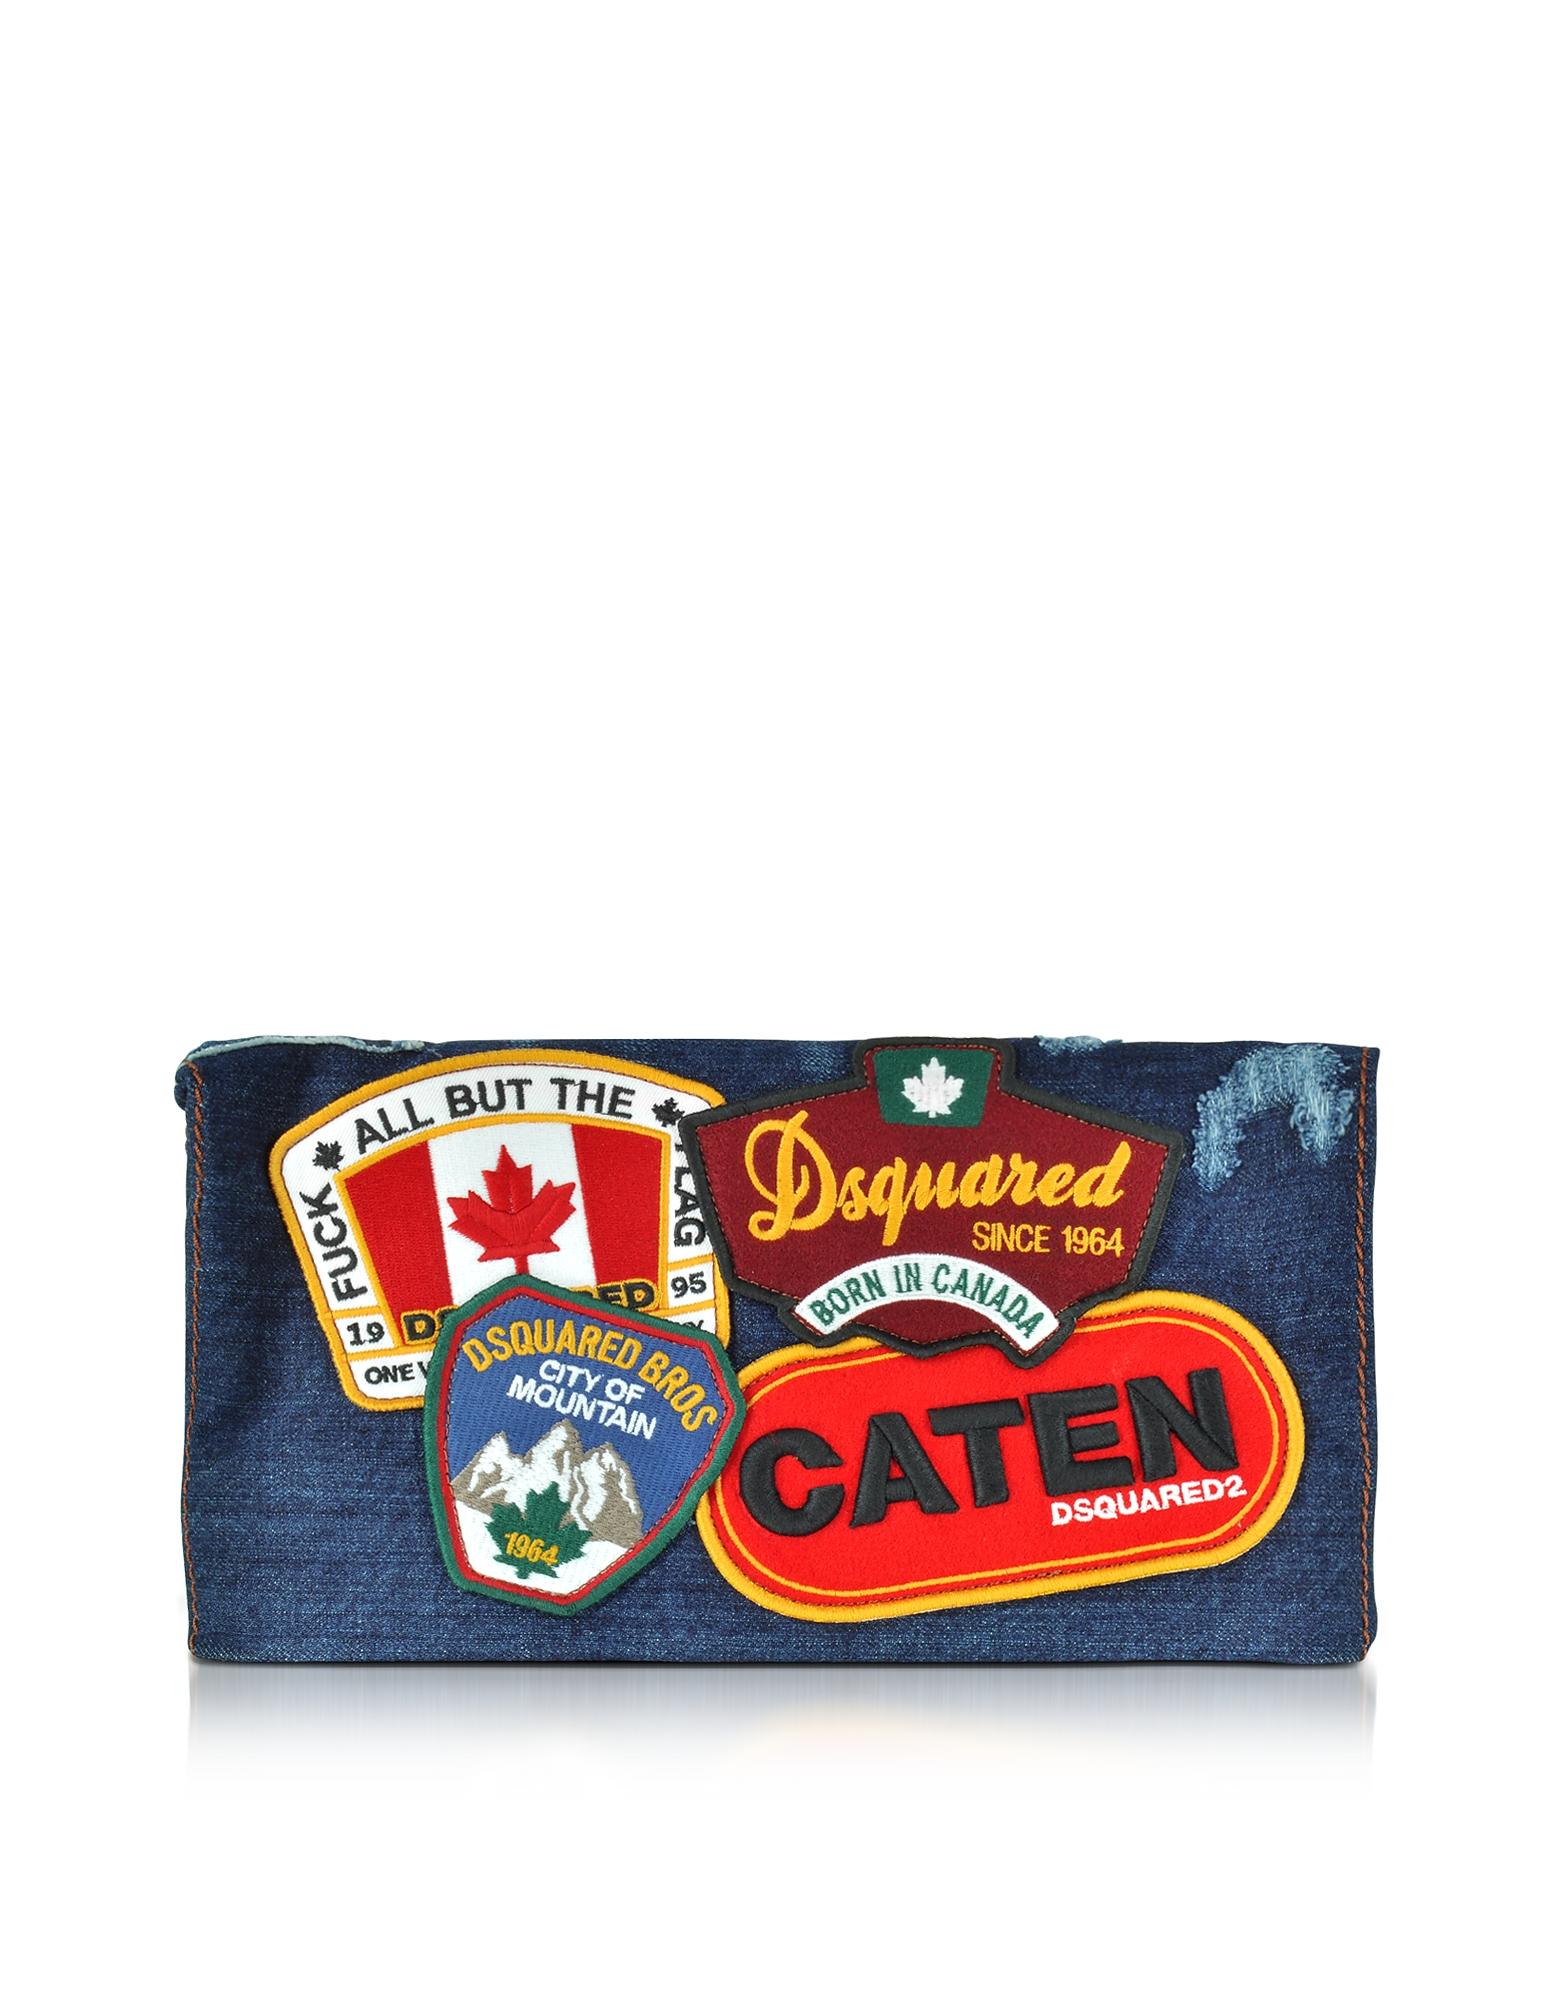 DSquared2 Handbags, Denim Destroyed Clutch w/Patches